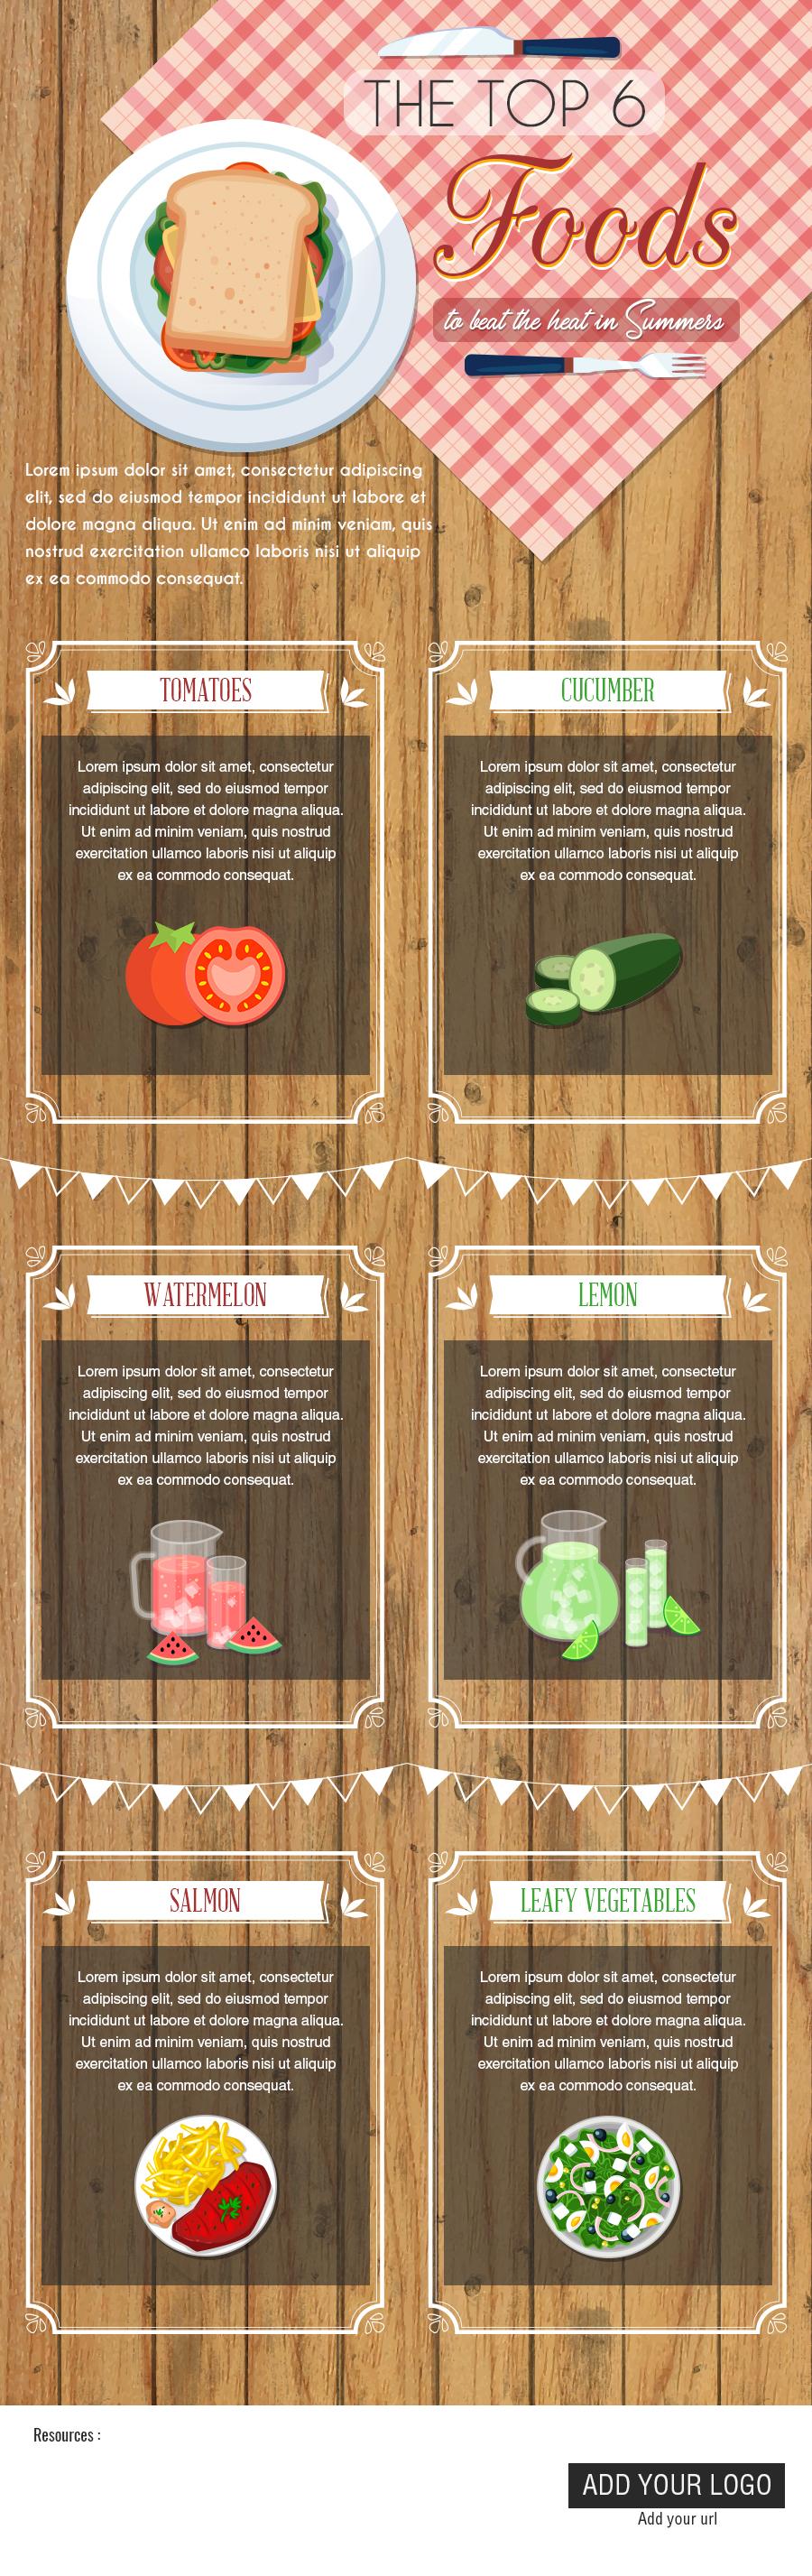 summers food